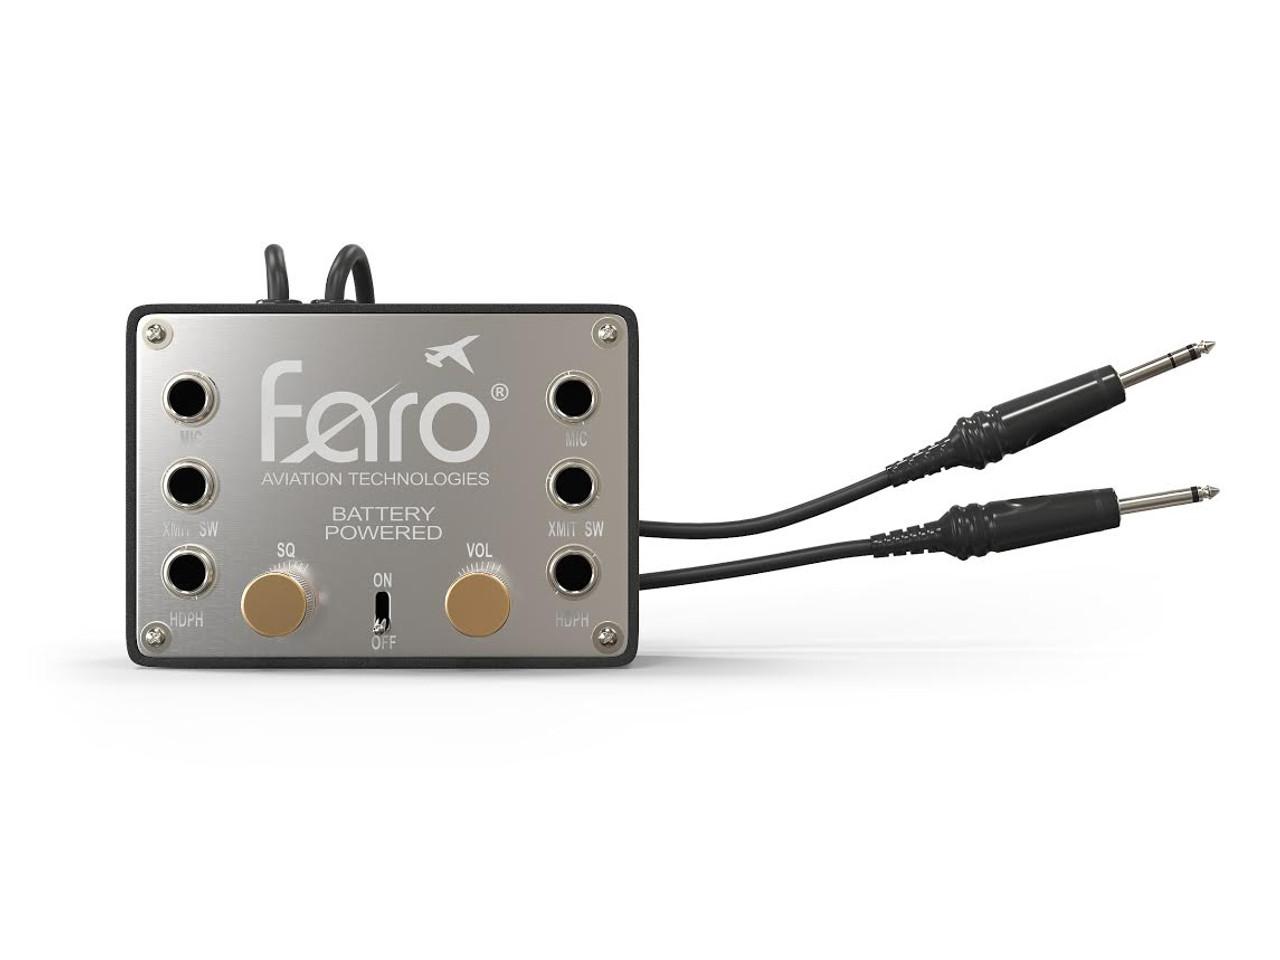 Faro Intercom